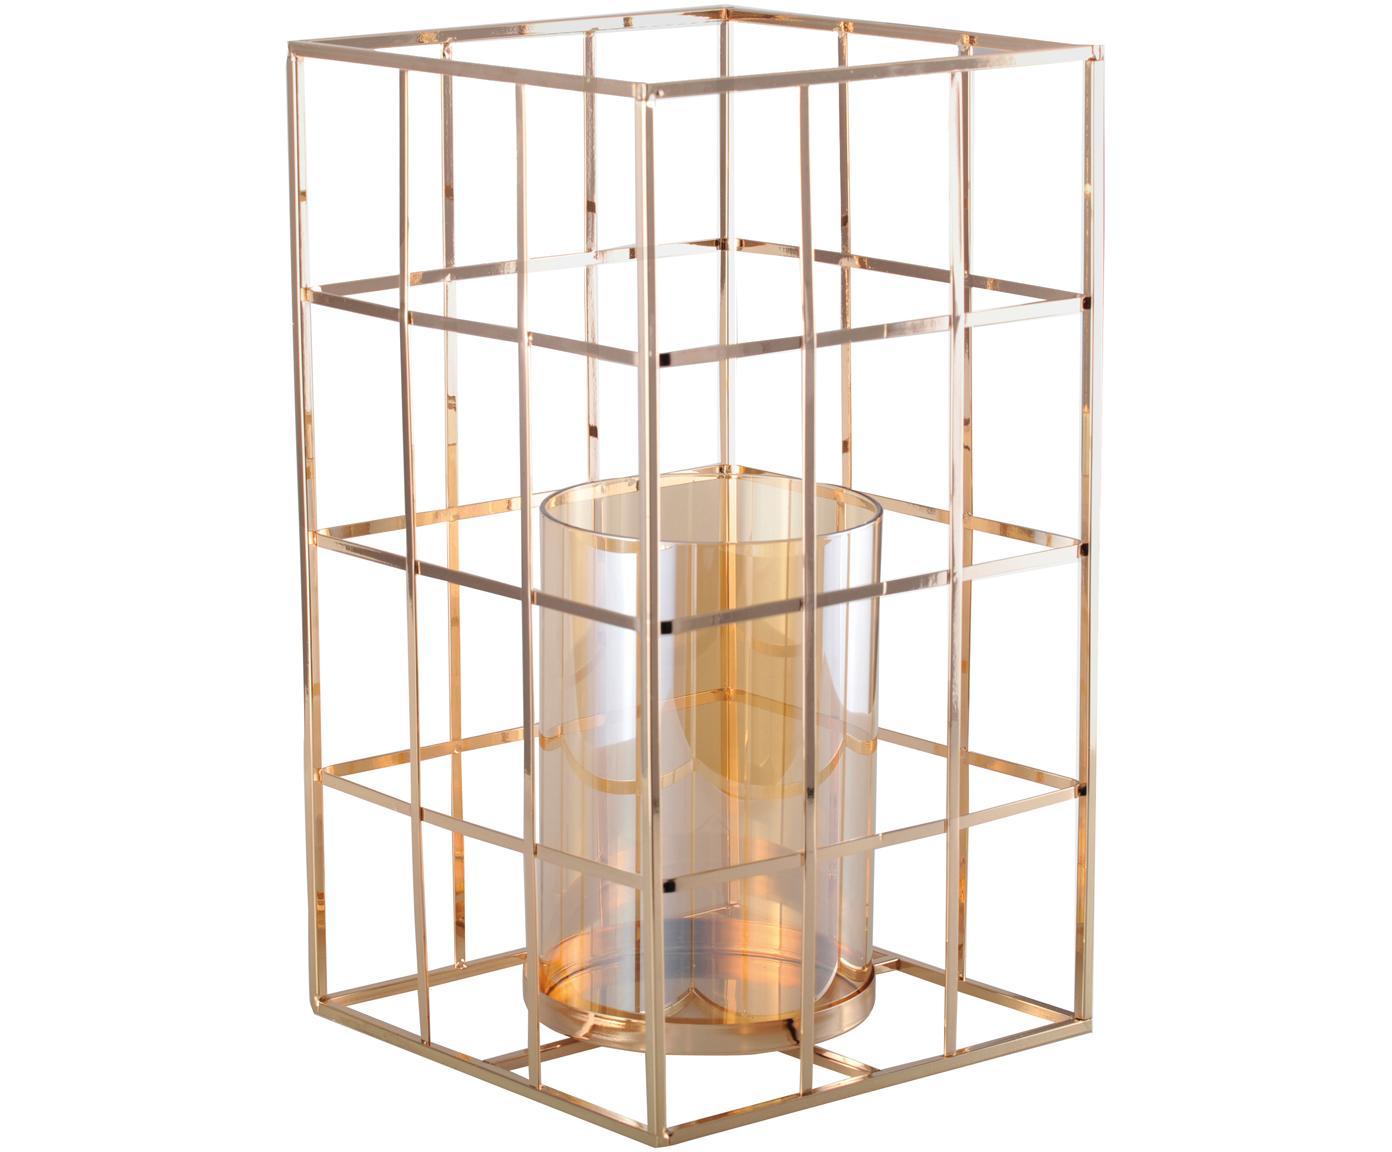 Portacandela Kubic, Struttura: metallo, Portacandela: vetro, Dorato, Larg. 17 x Alt. 20 cm